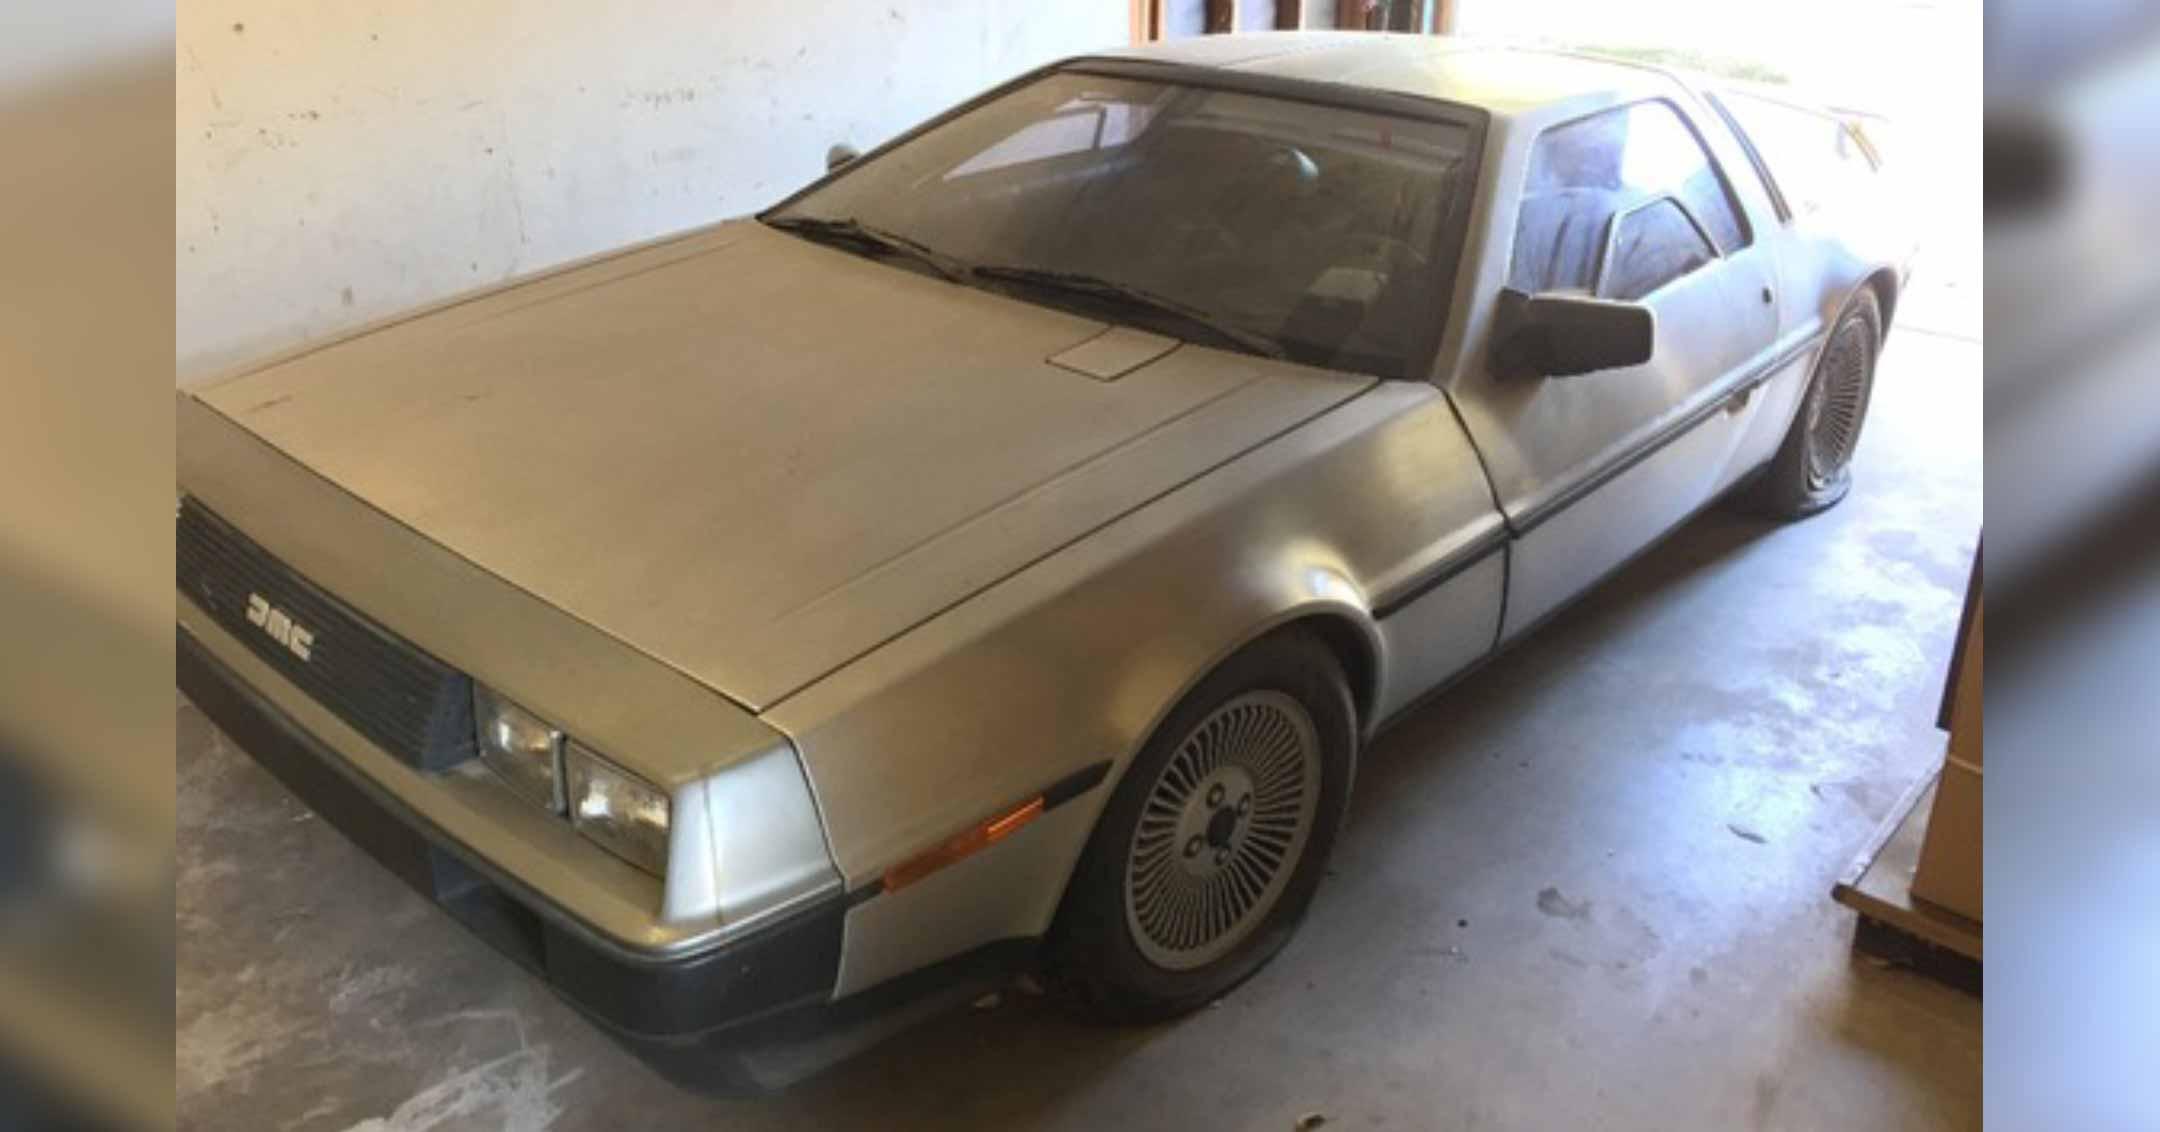 SCEDT26T8BD000707 | DeLoreanDirectorey.com